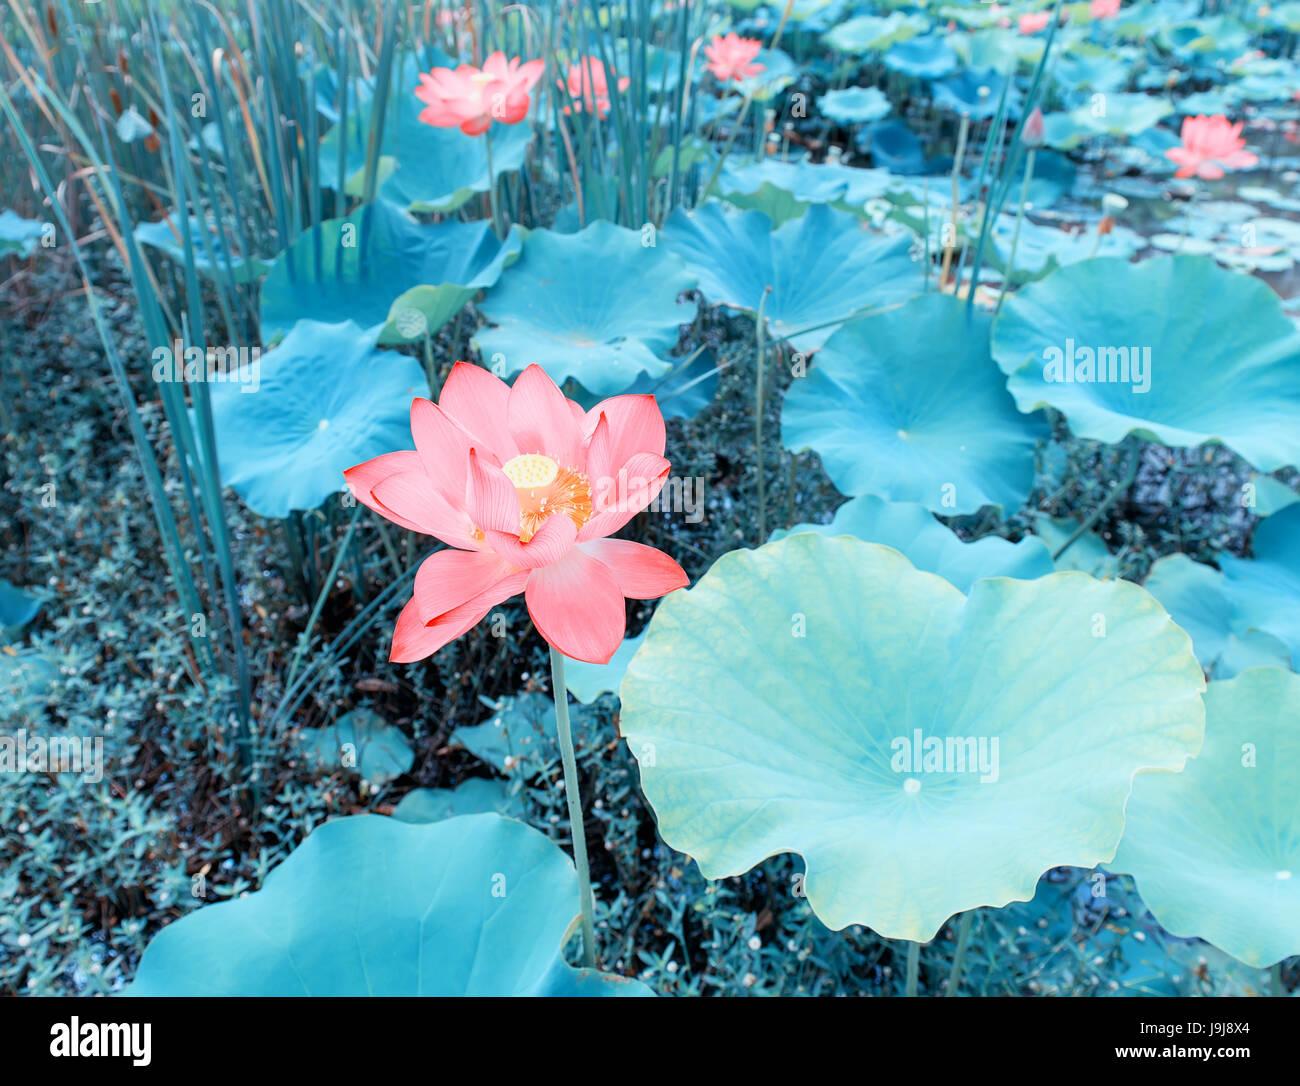 Waterlily or lotus flower in watersymbol of purity stock photo waterlily or lotus flower in watersymbol of purity mightylinksfo